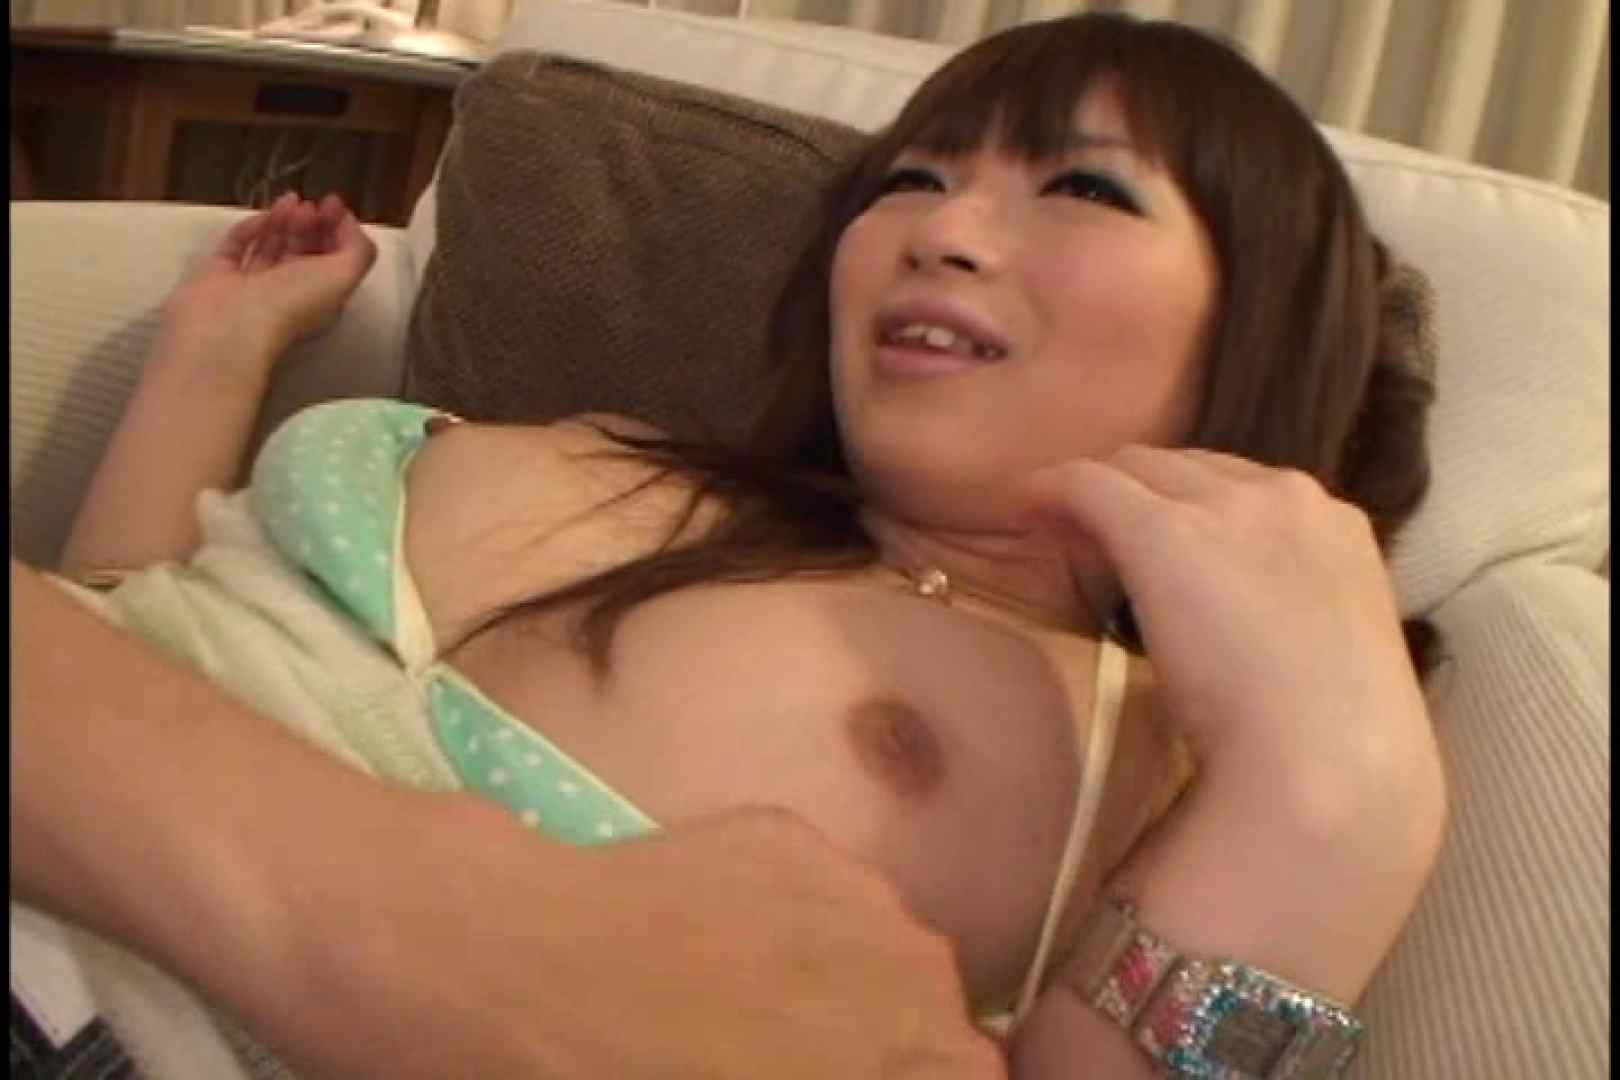 JDハンター全国ツアー vol.039 前編 女子大生のエロ動画 | 0  81PIX 43